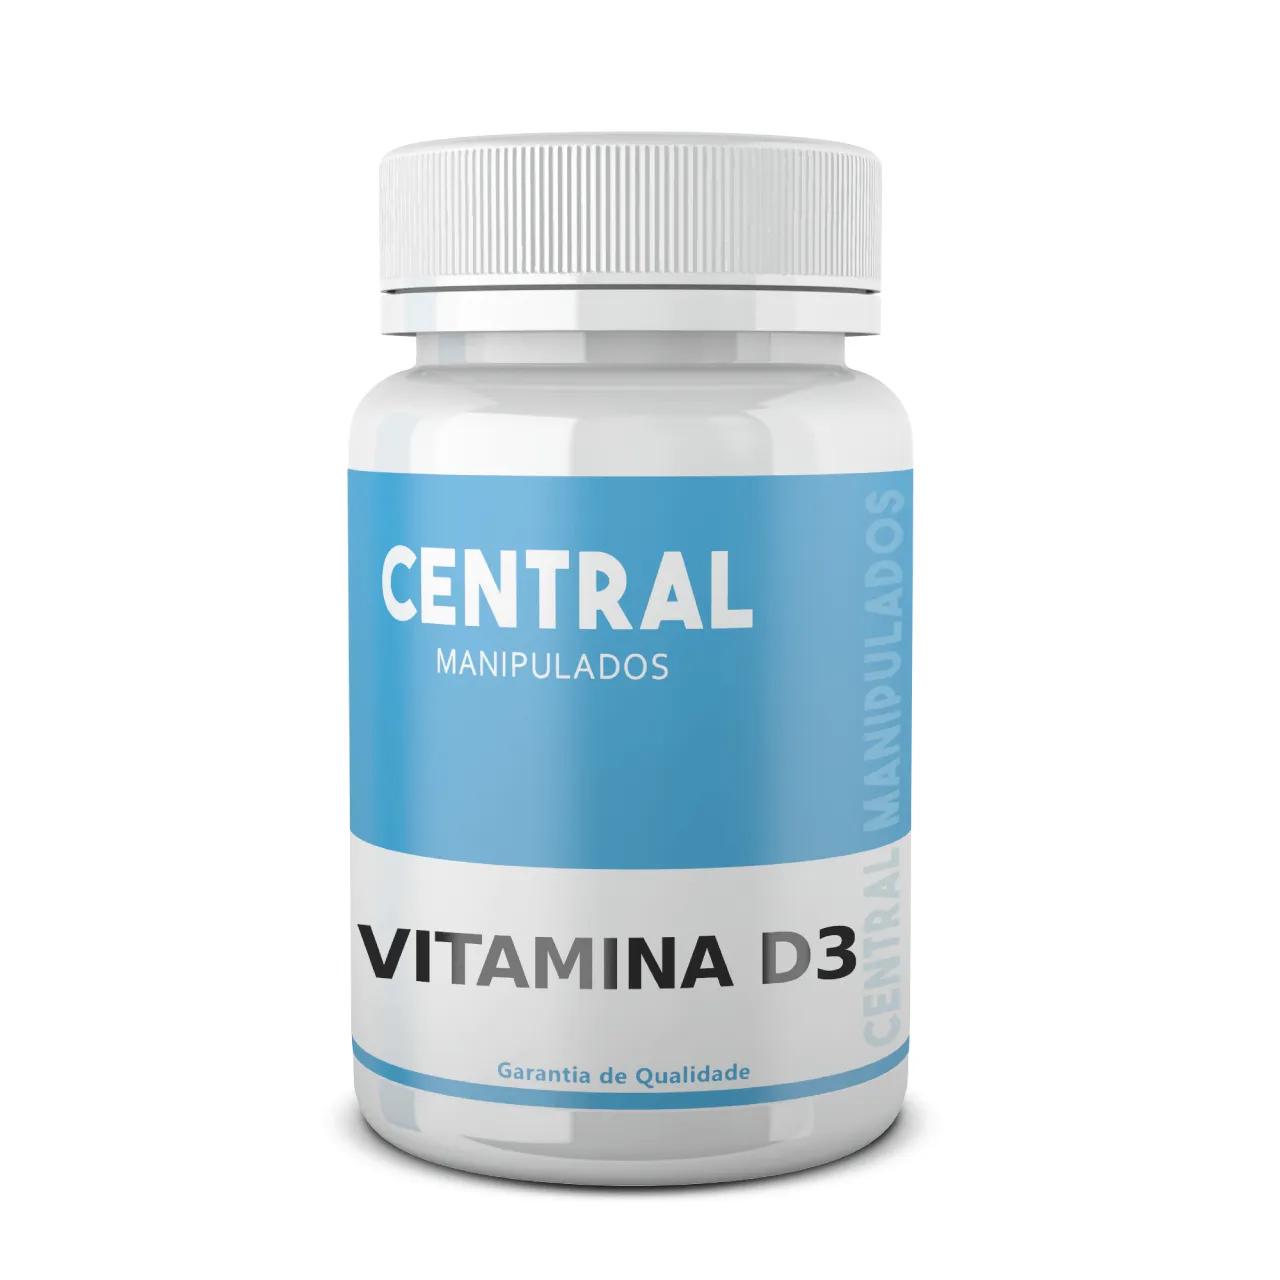 Vitamina D3 5.000 UI - 180 cápsulas - Saúde Óssea e Muscular